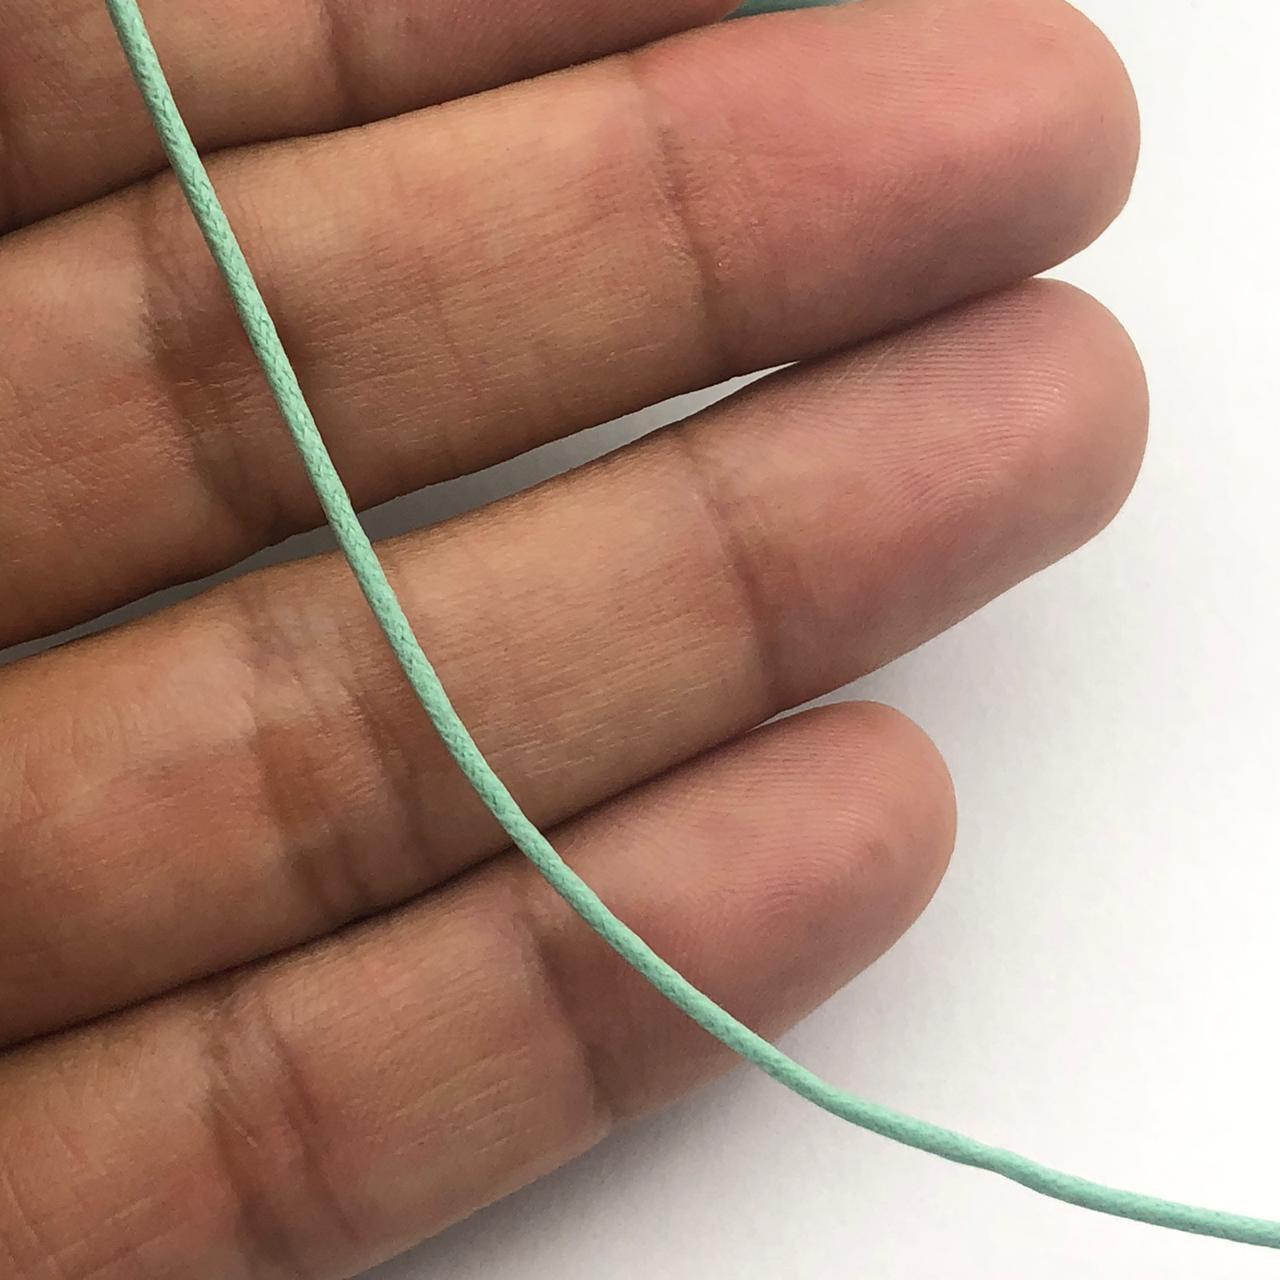 FE68 - Fio Encerado Calipso - 5metros